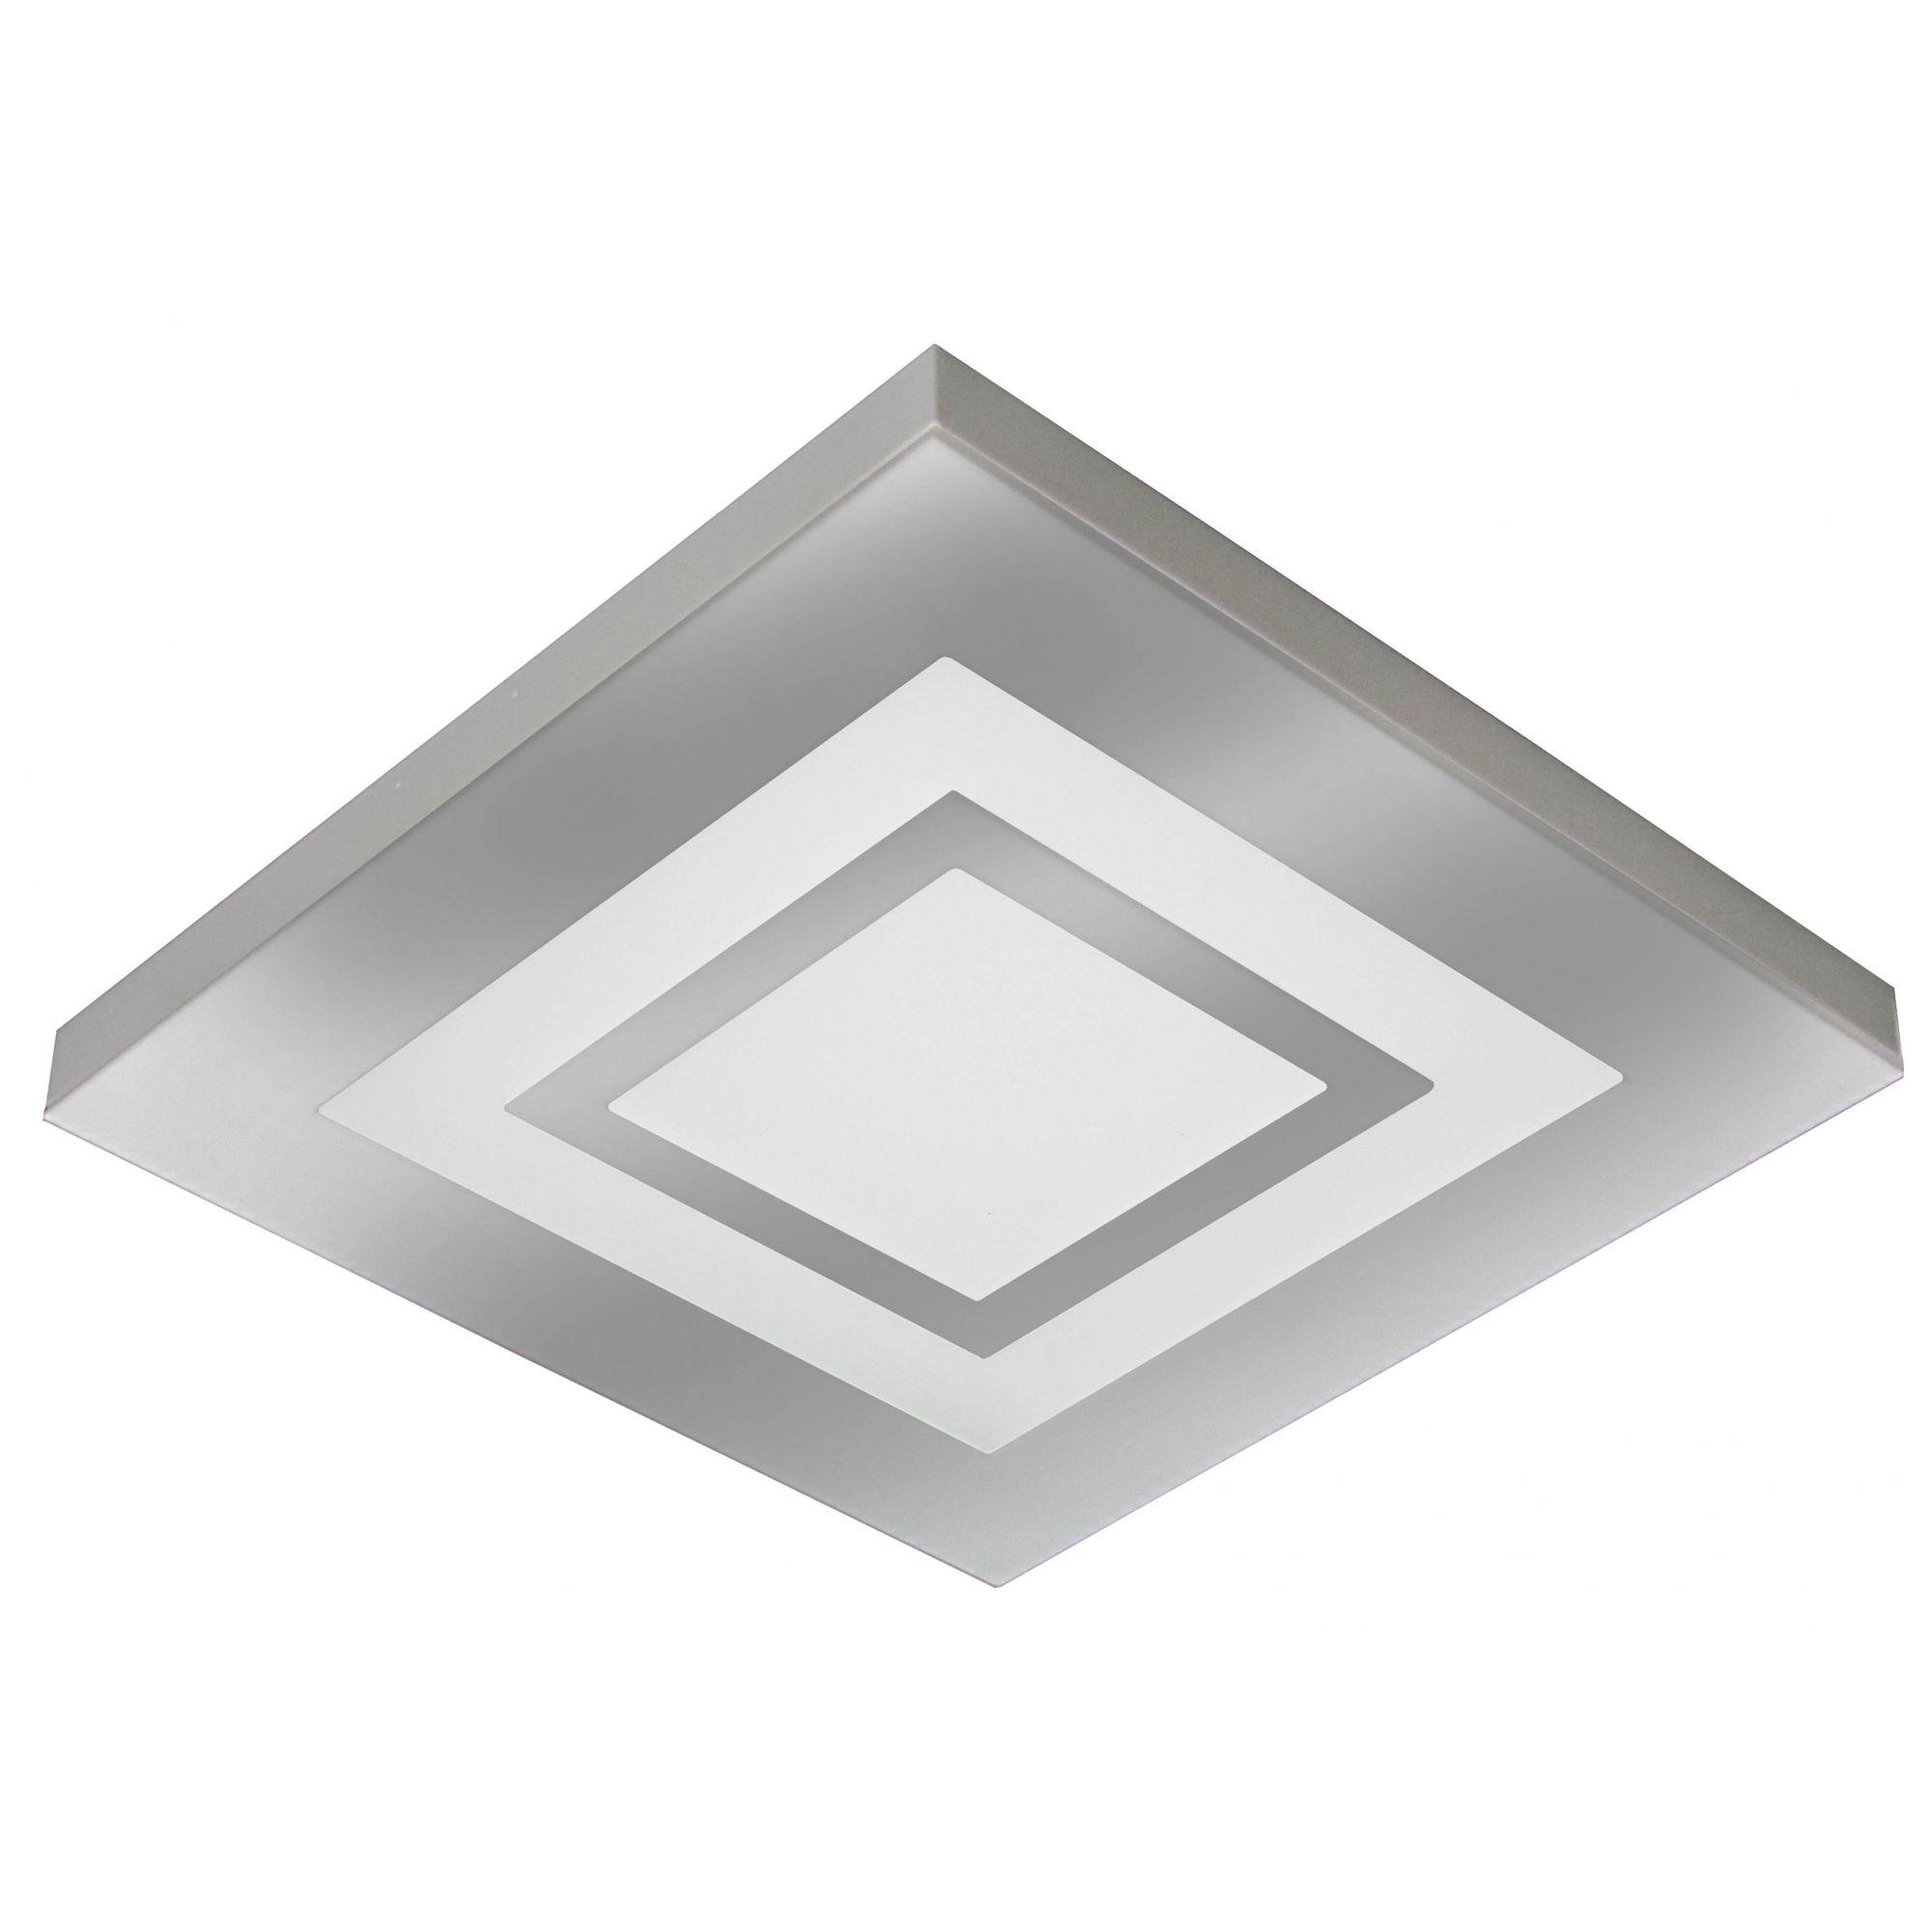 PLAFON LED ROMA 25W 6500W ESPELHADO - TUALUX